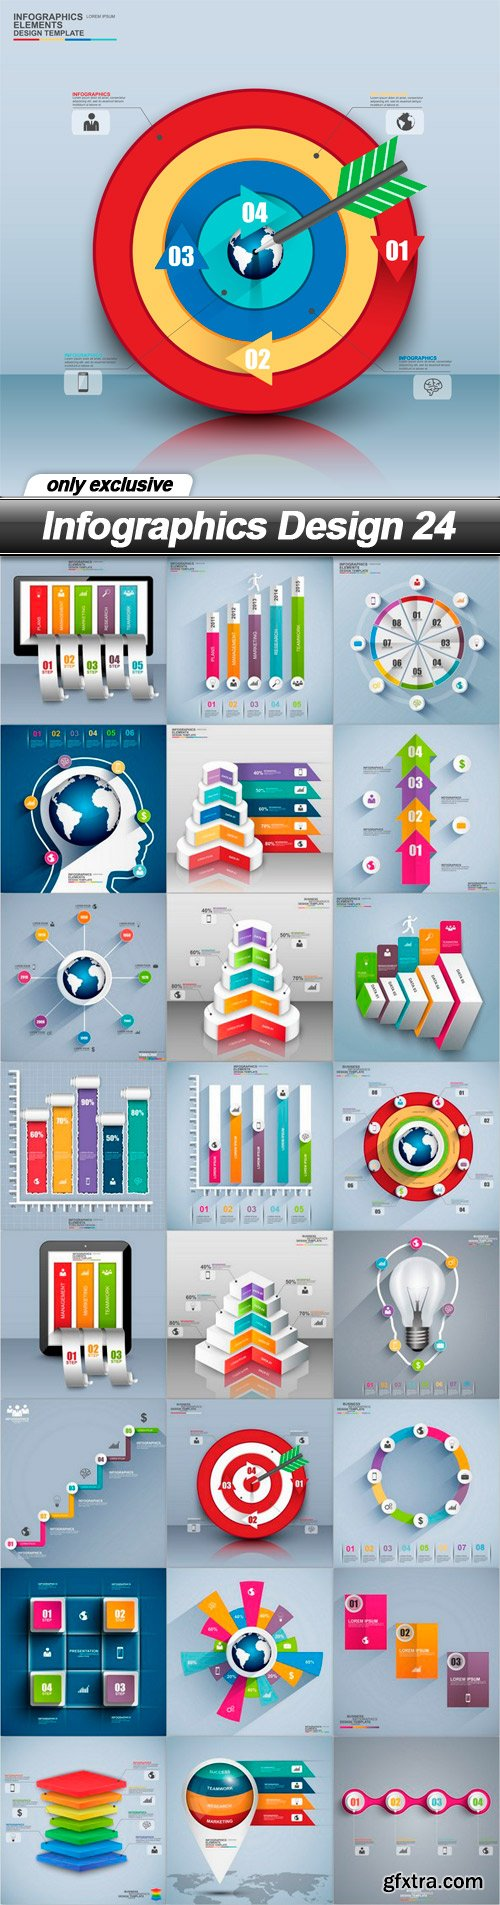 Infographics Design 24 - 25 EPS